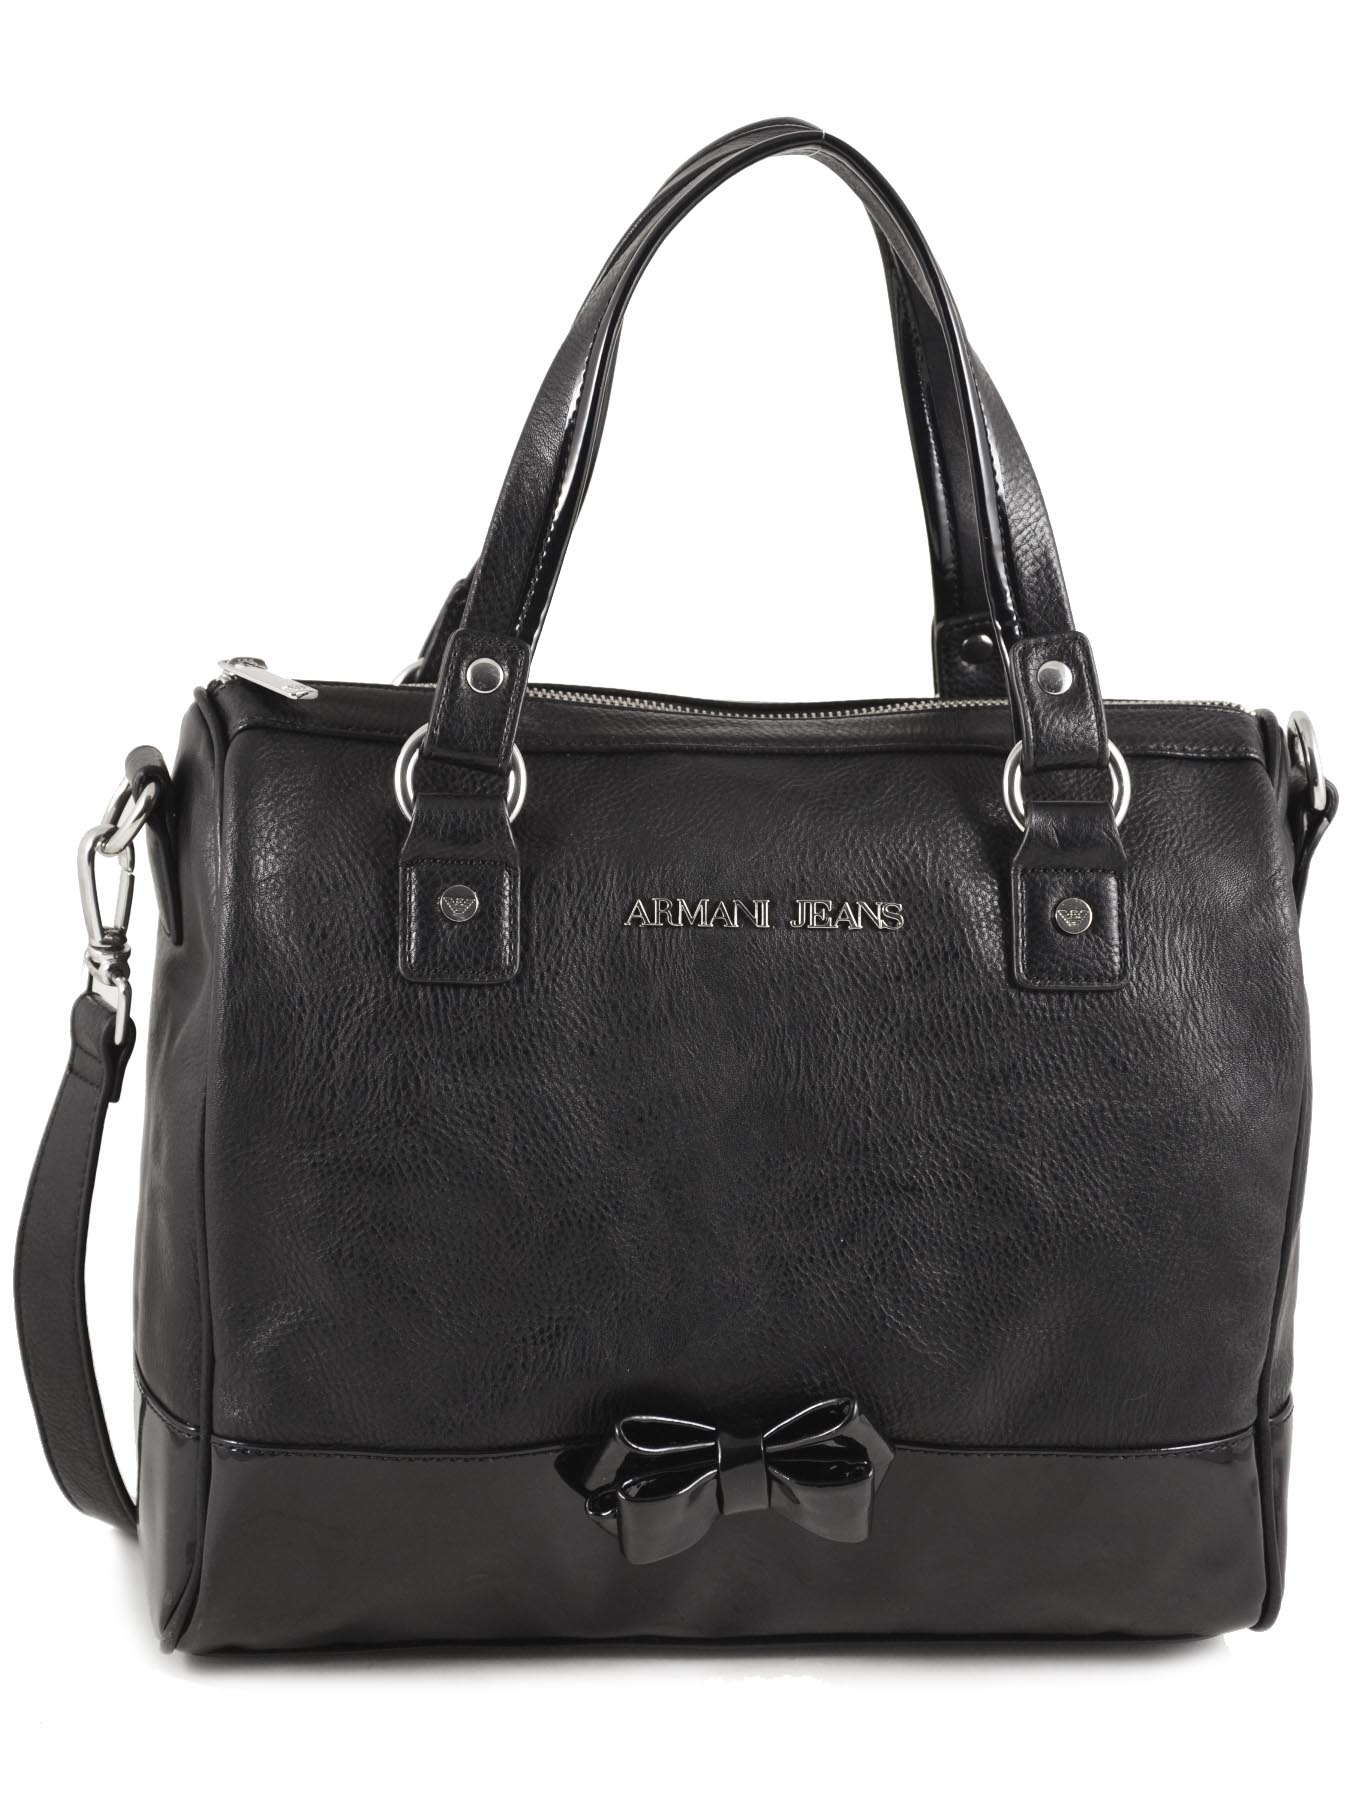 pin sac armani jeans verni noir femme 05291 55 12 go pics on pinterest. Black Bedroom Furniture Sets. Home Design Ideas